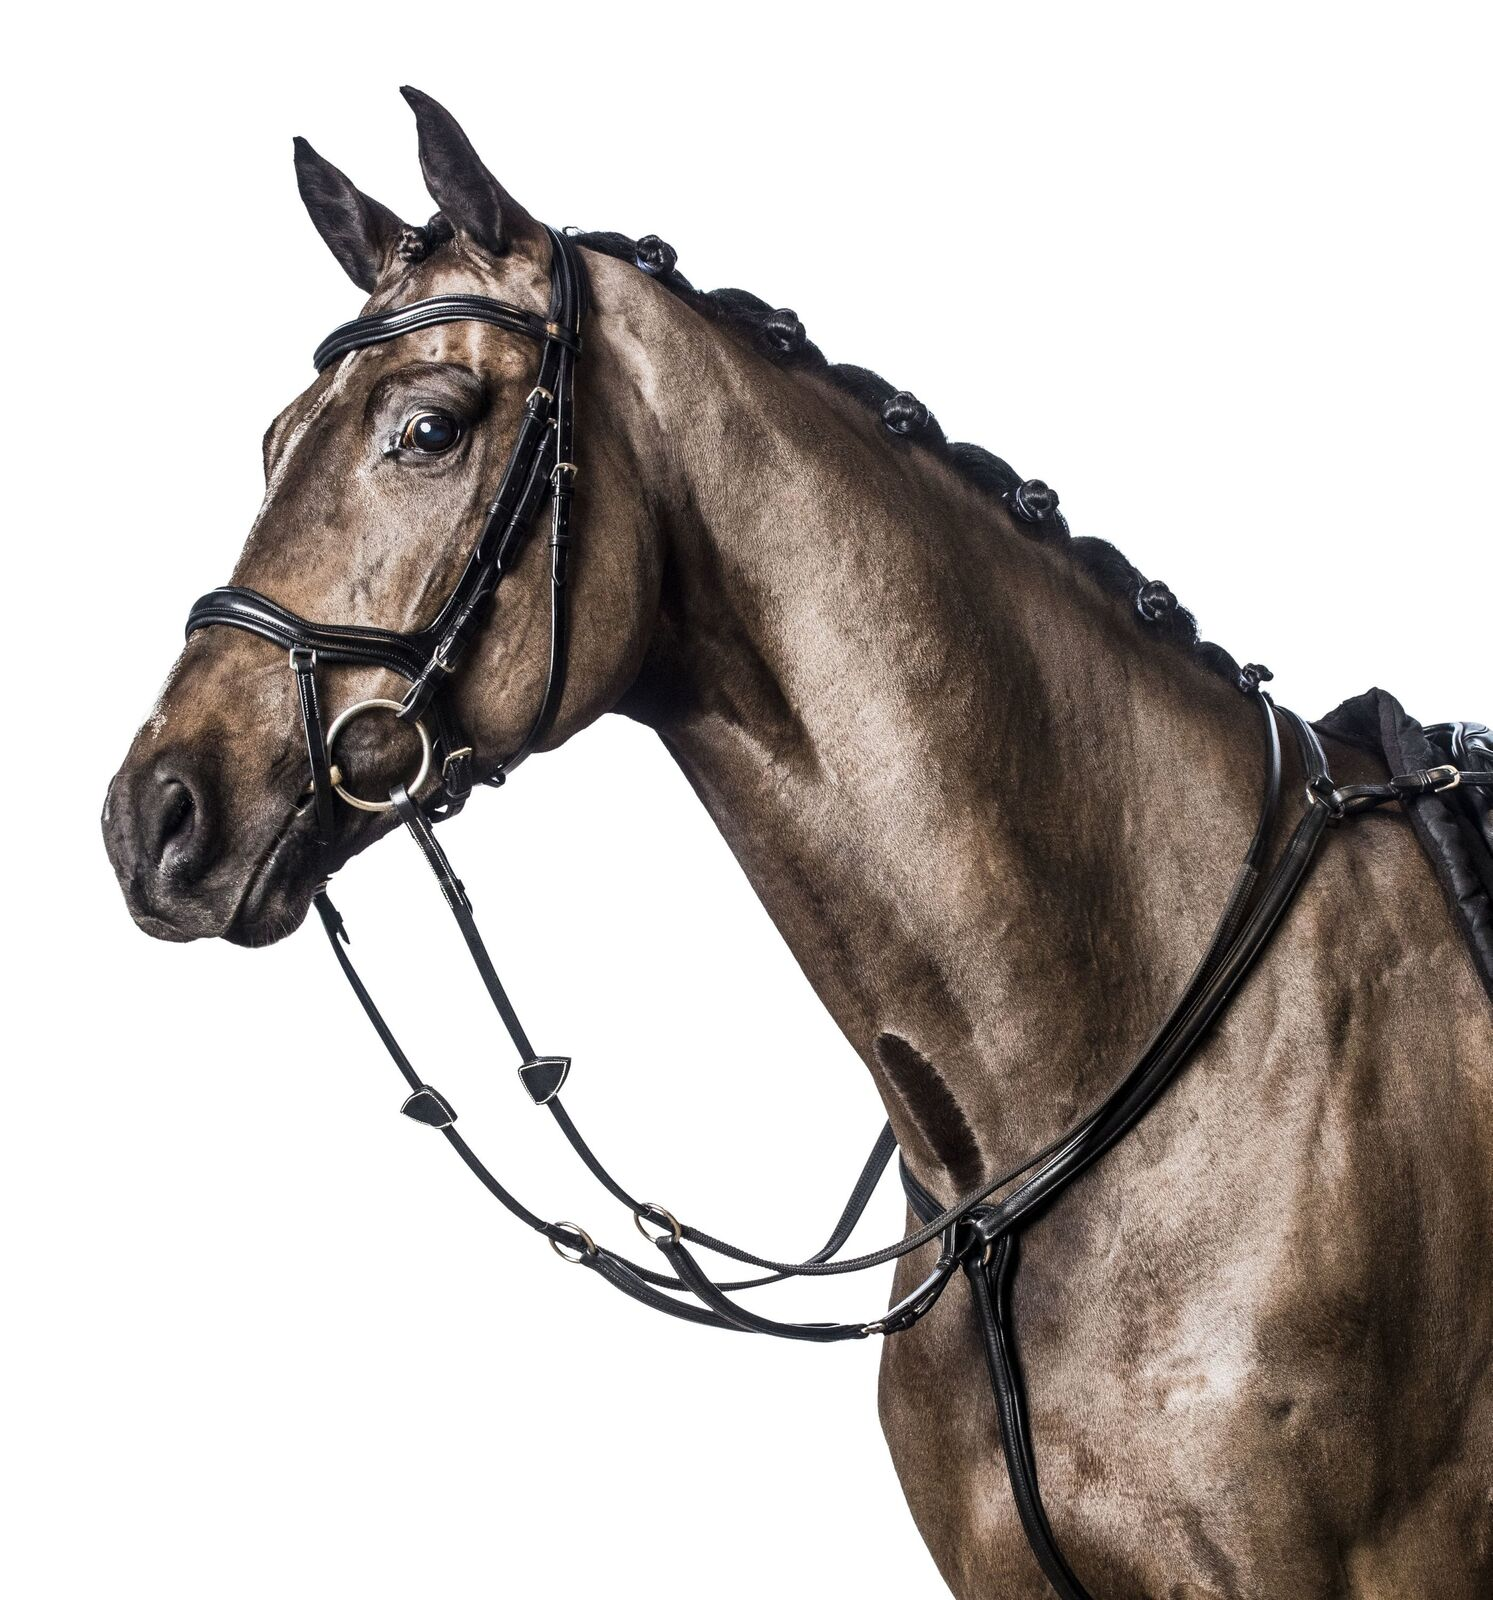 Horseguard Trense, hannoversch. Reithalfter, engl. Leder, nero